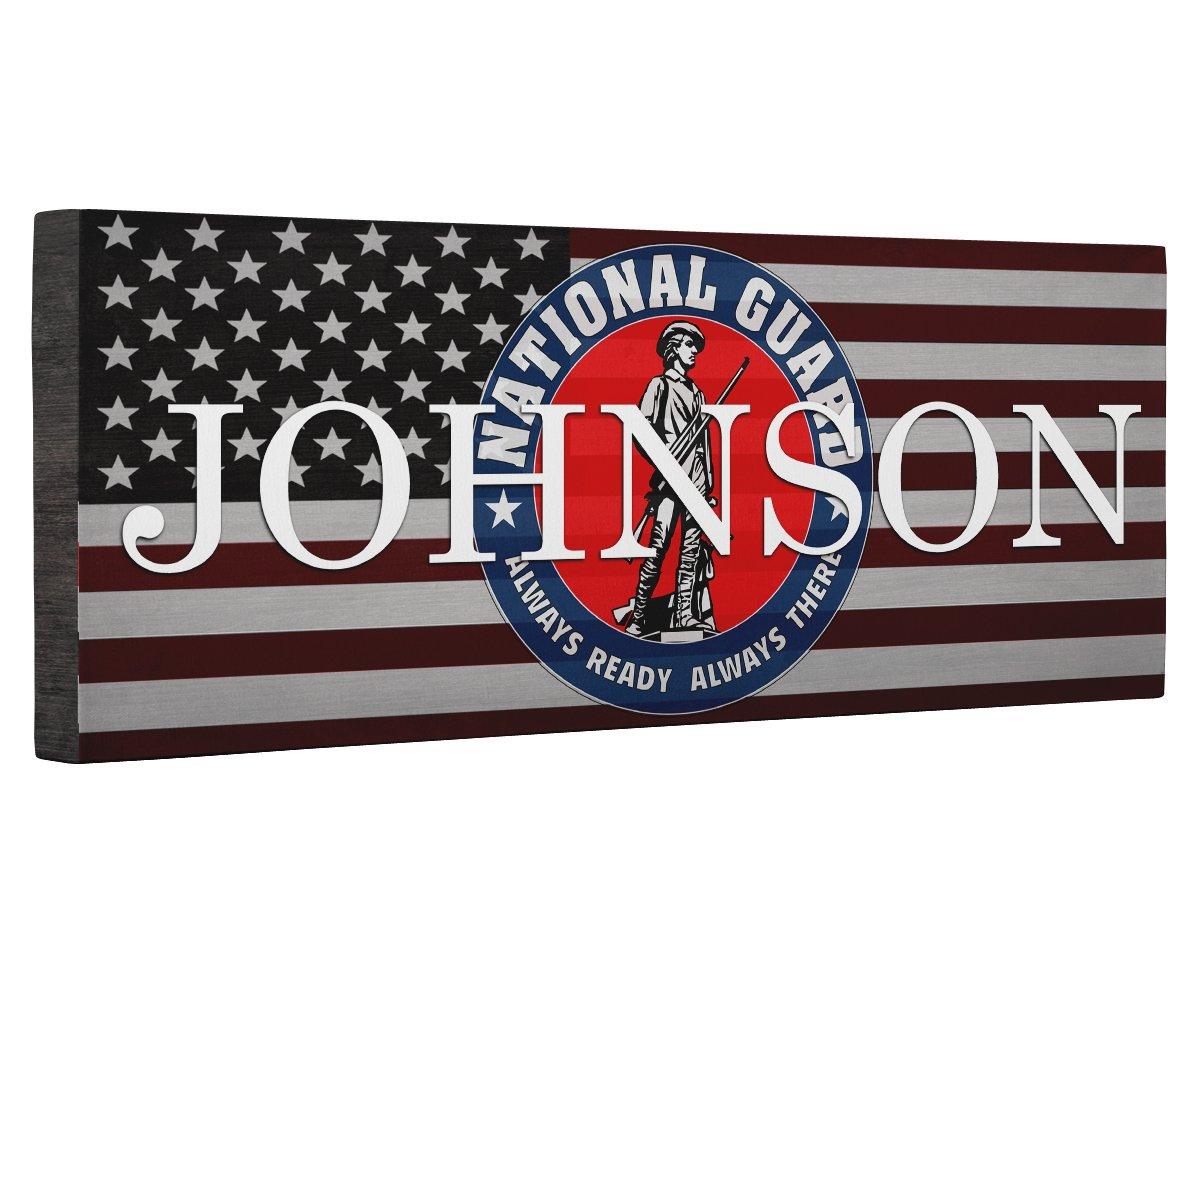 Hero National Guard Flag CANVAS Wall Art Home Décor